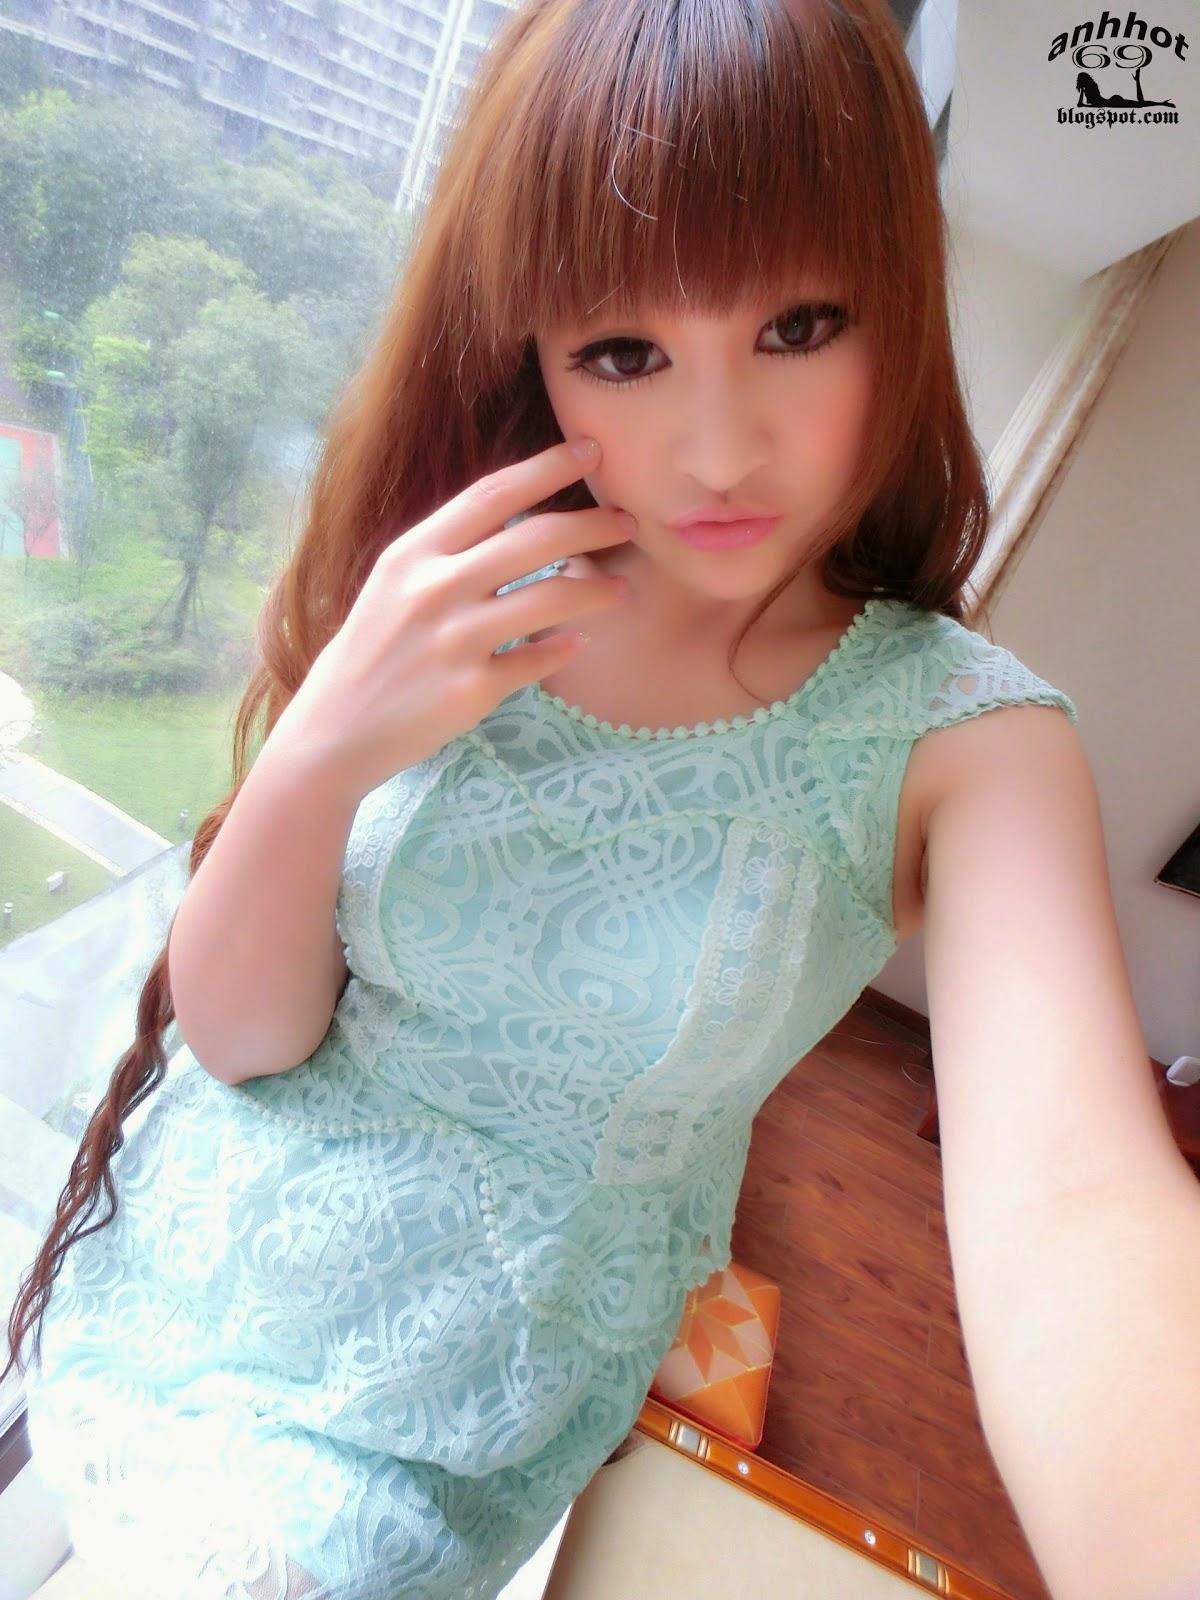 Suxia_h8_11744440081b12d5c8o